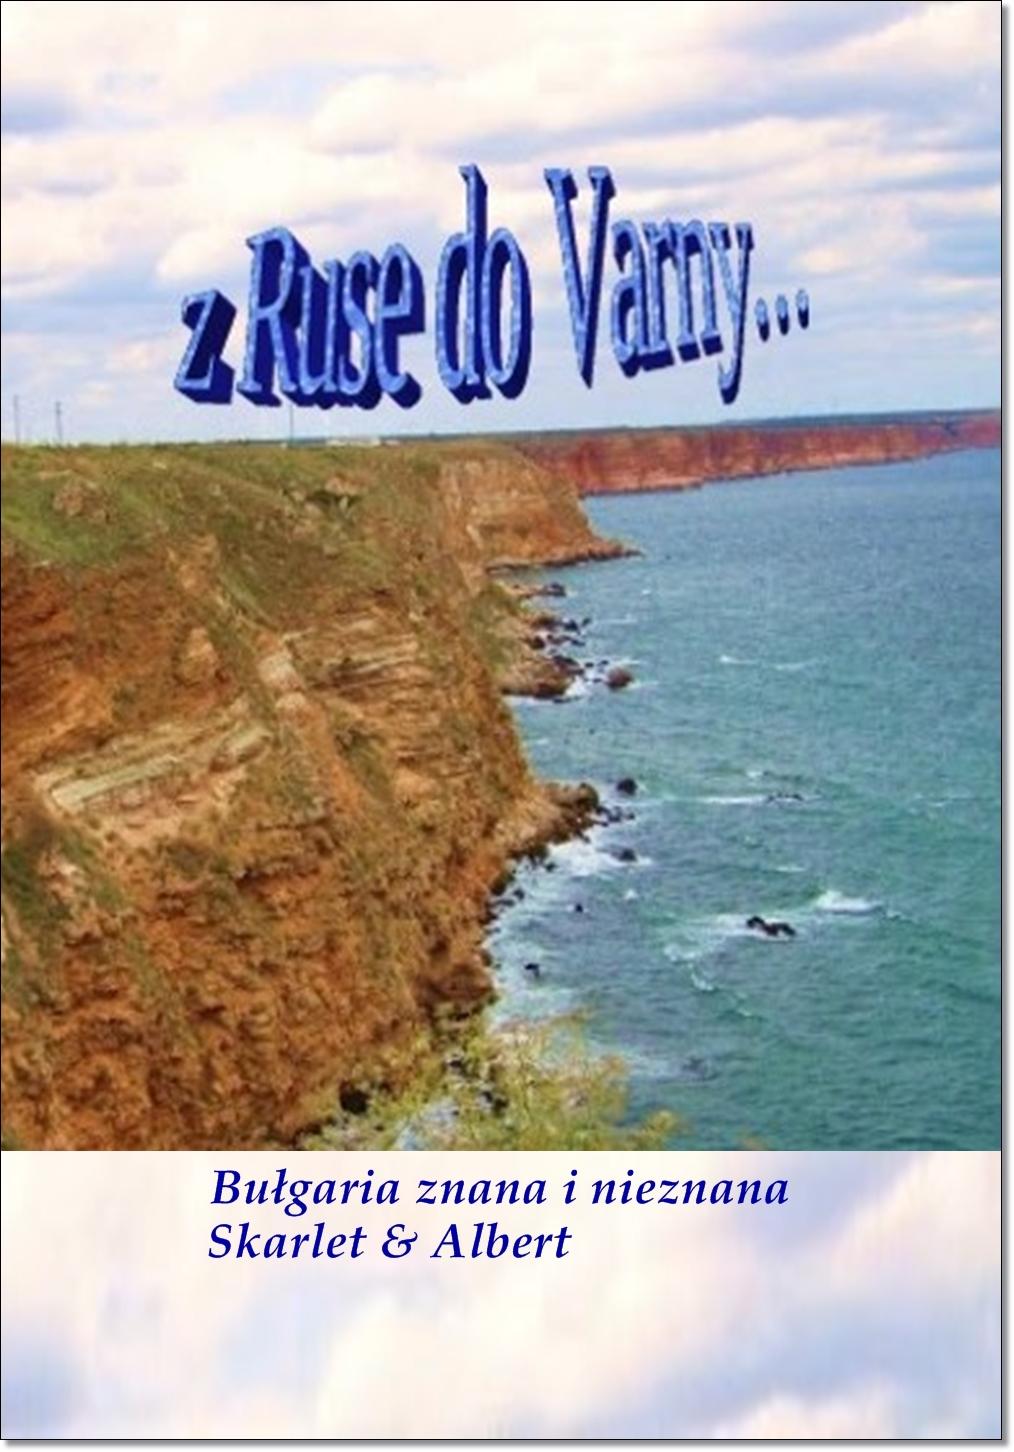 Bułgaria znana i nieznana: Z Ruse do Varny...